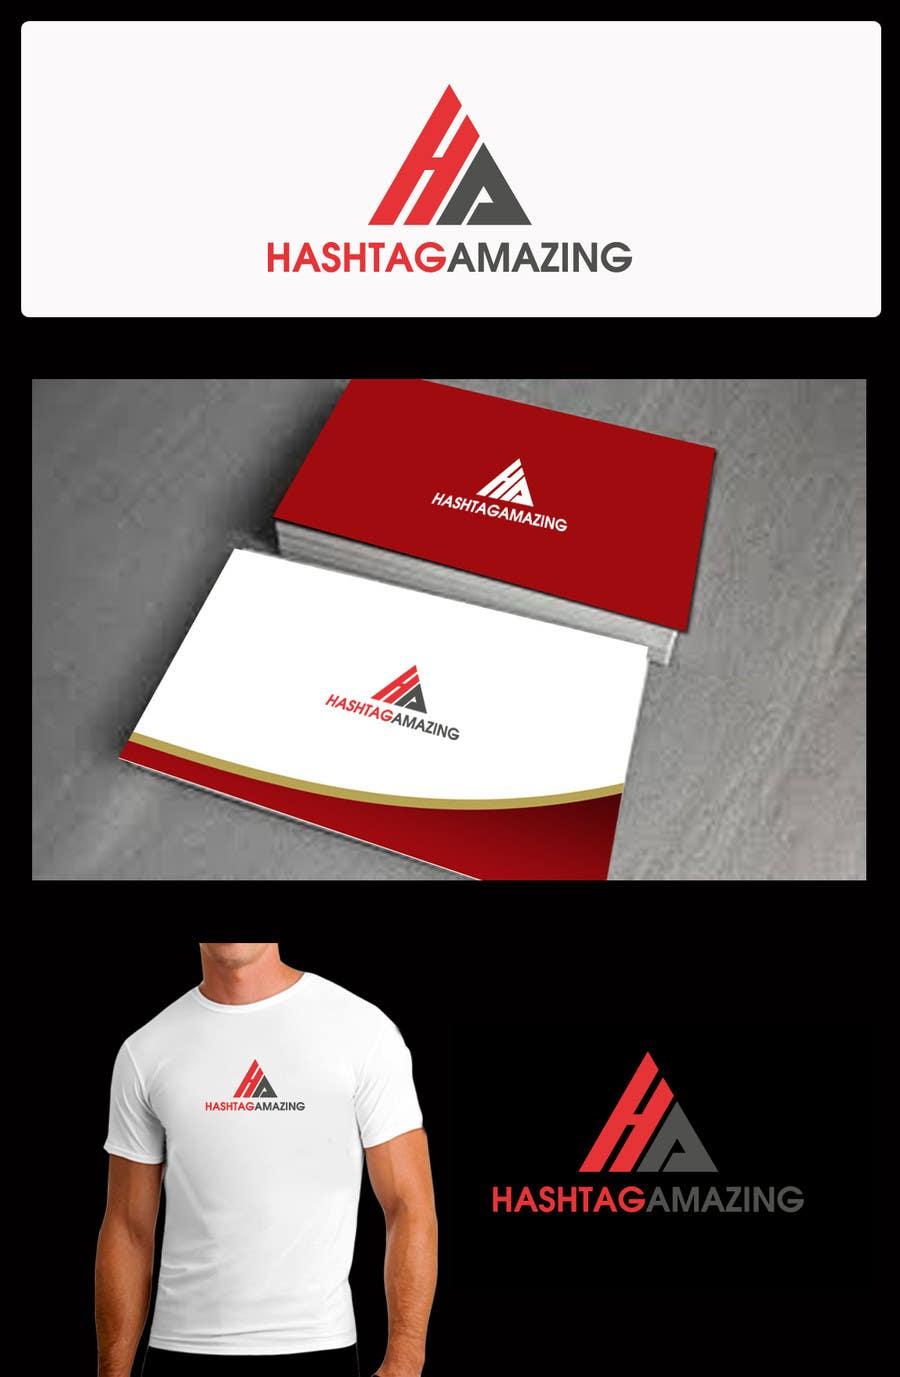 Penyertaan Peraduan #97 untuk Design a Logo for Hashtagamazing Ltd